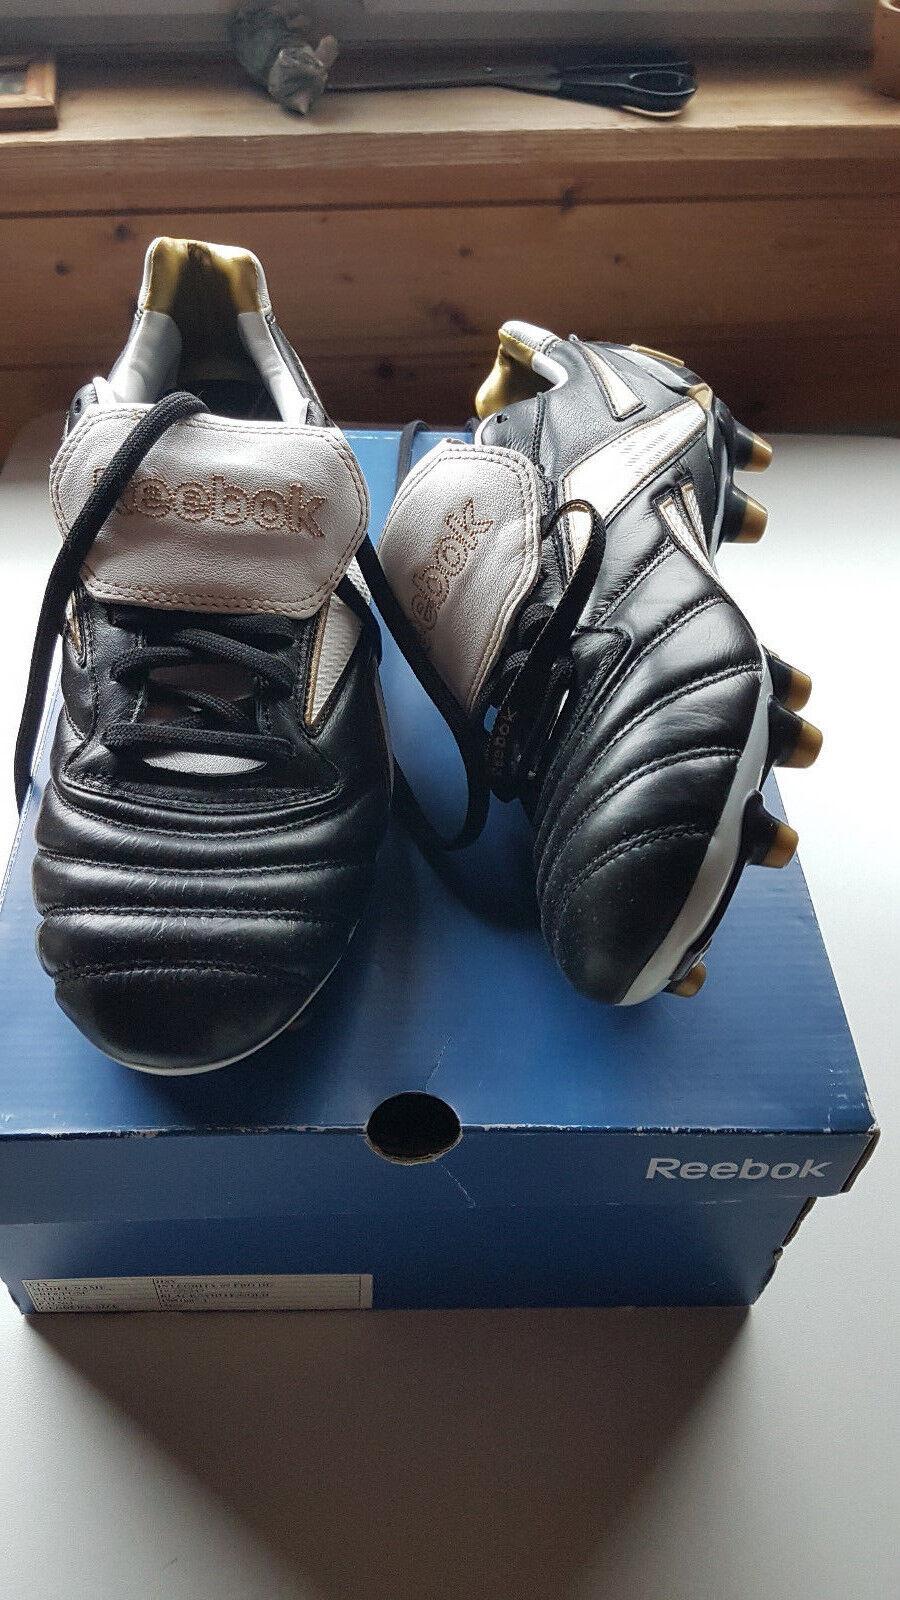 4a7b224c15 INTEGRITY 09 SG UK 8 - EUR 42 Fußballschuhe - REEBOK nspcvp7424-Schuhe